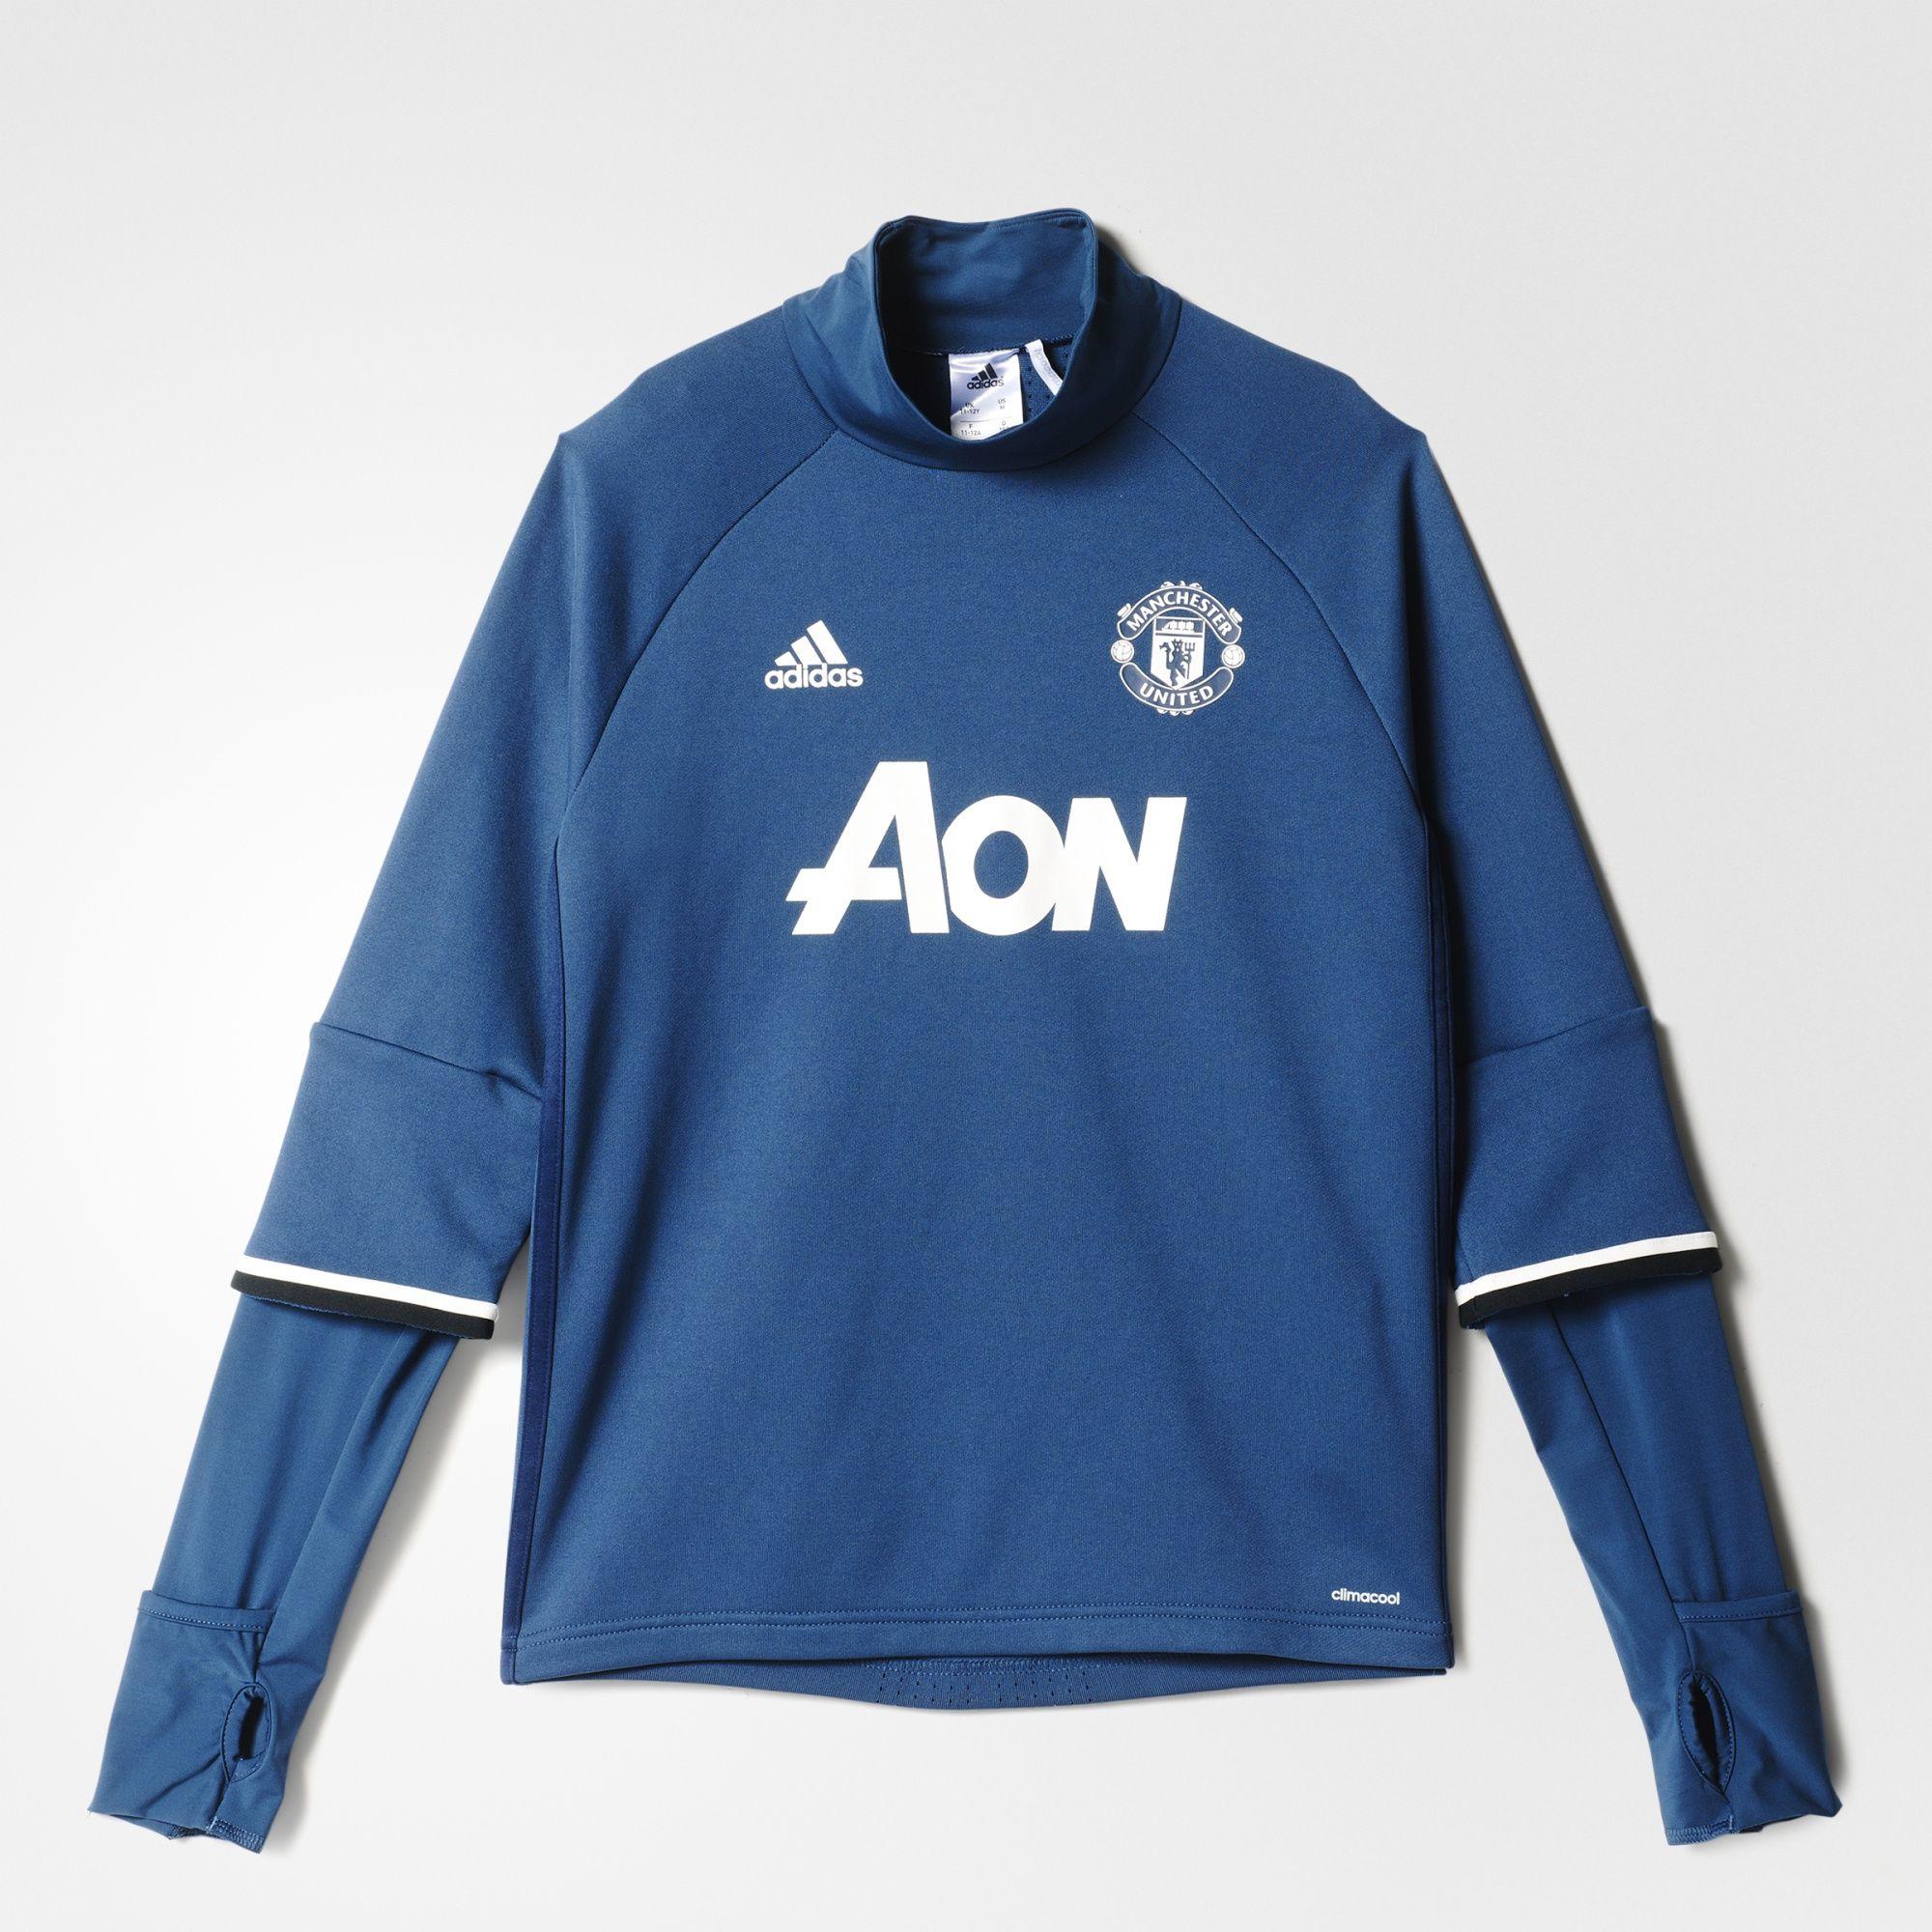 Bluza trening dziecięca adidas Manchester Utd 140